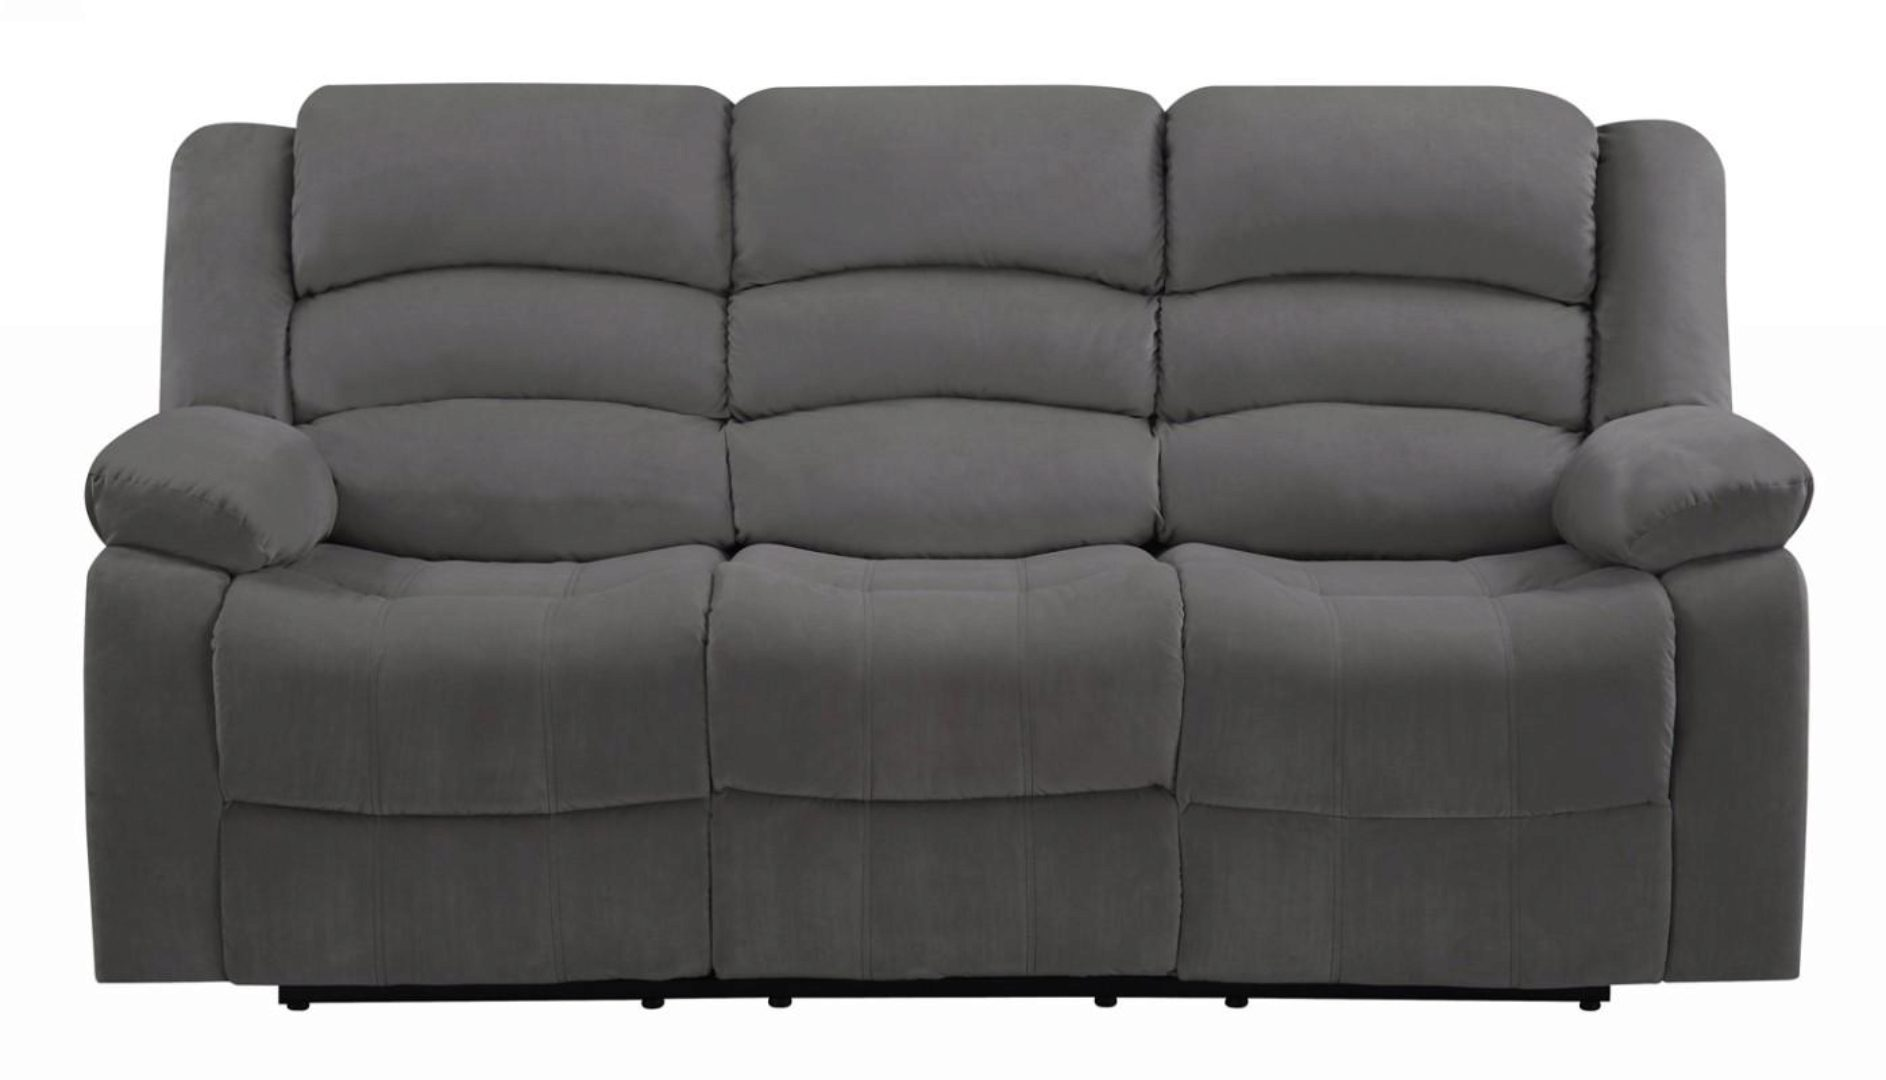 gray microfiber sofa set 3 pcs contemporary global united 9824